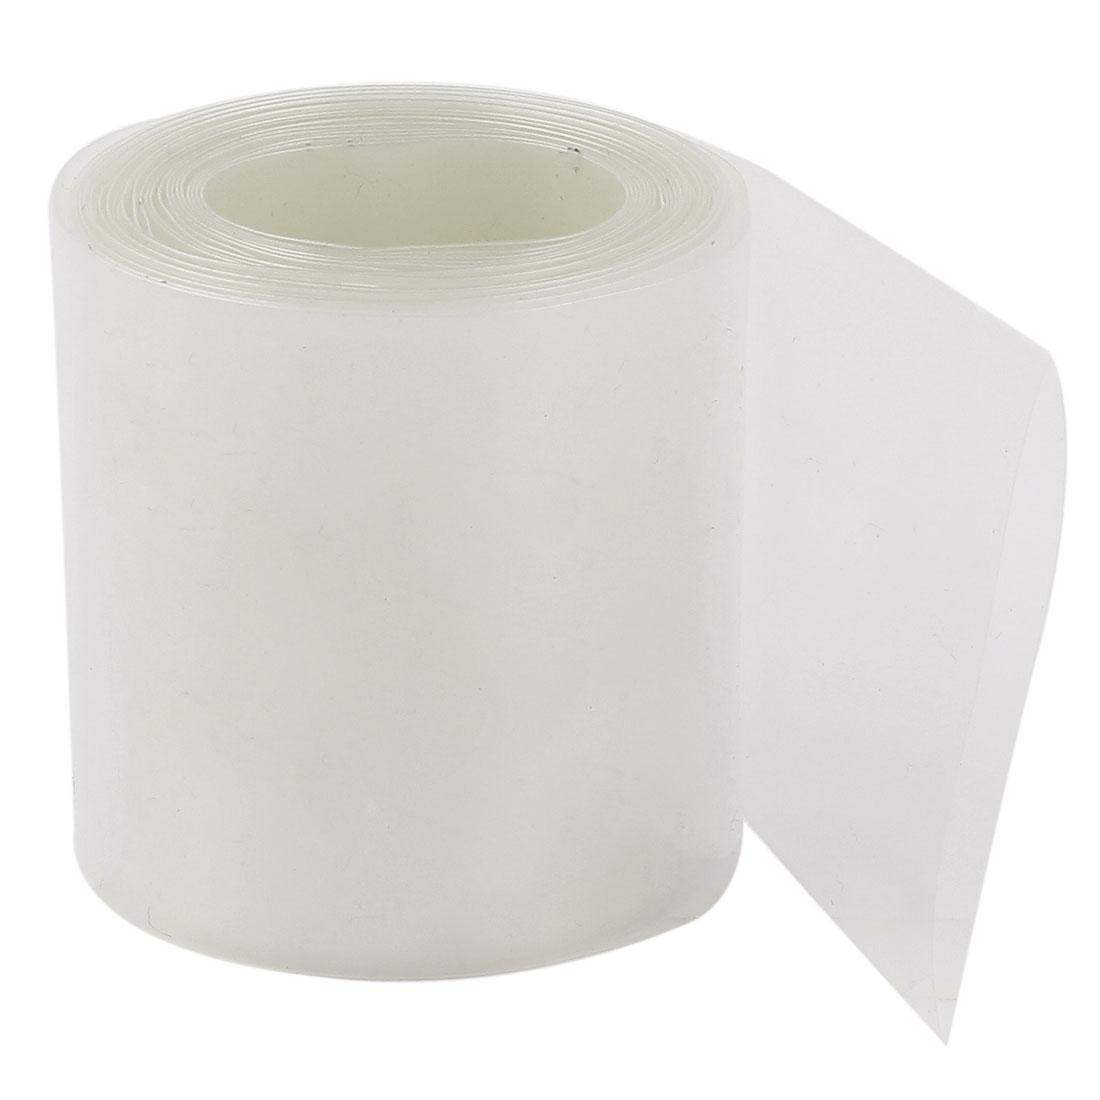 Clear 2:1 Polyolefin Heat Shrink Tubing Shrinkable Tube 5cm Wide 3Meter 10Ft